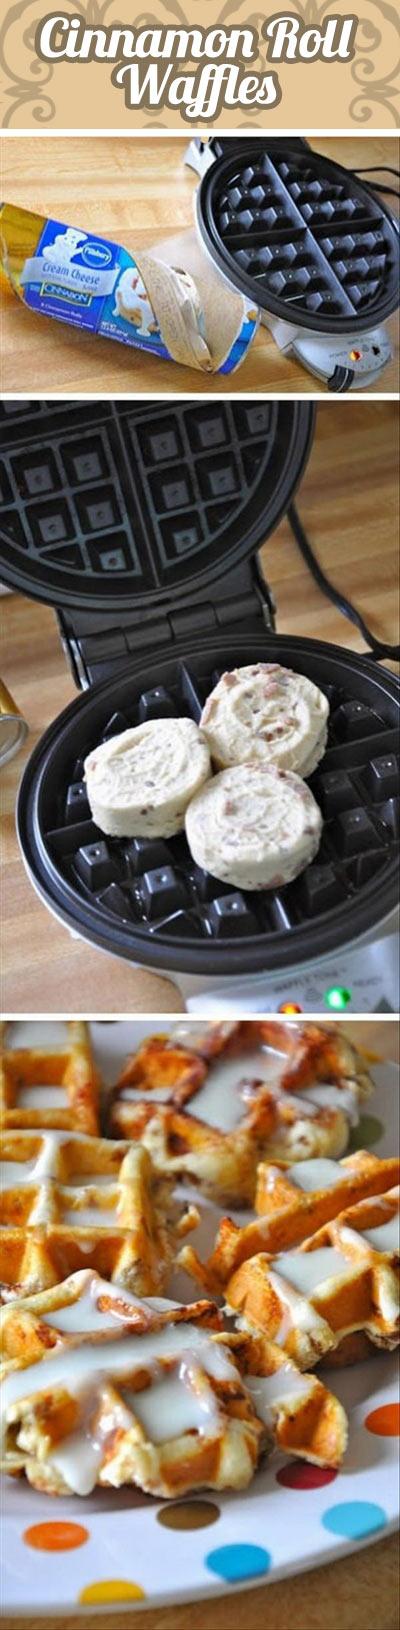 cool-cinnamon-waffles-dough-mix